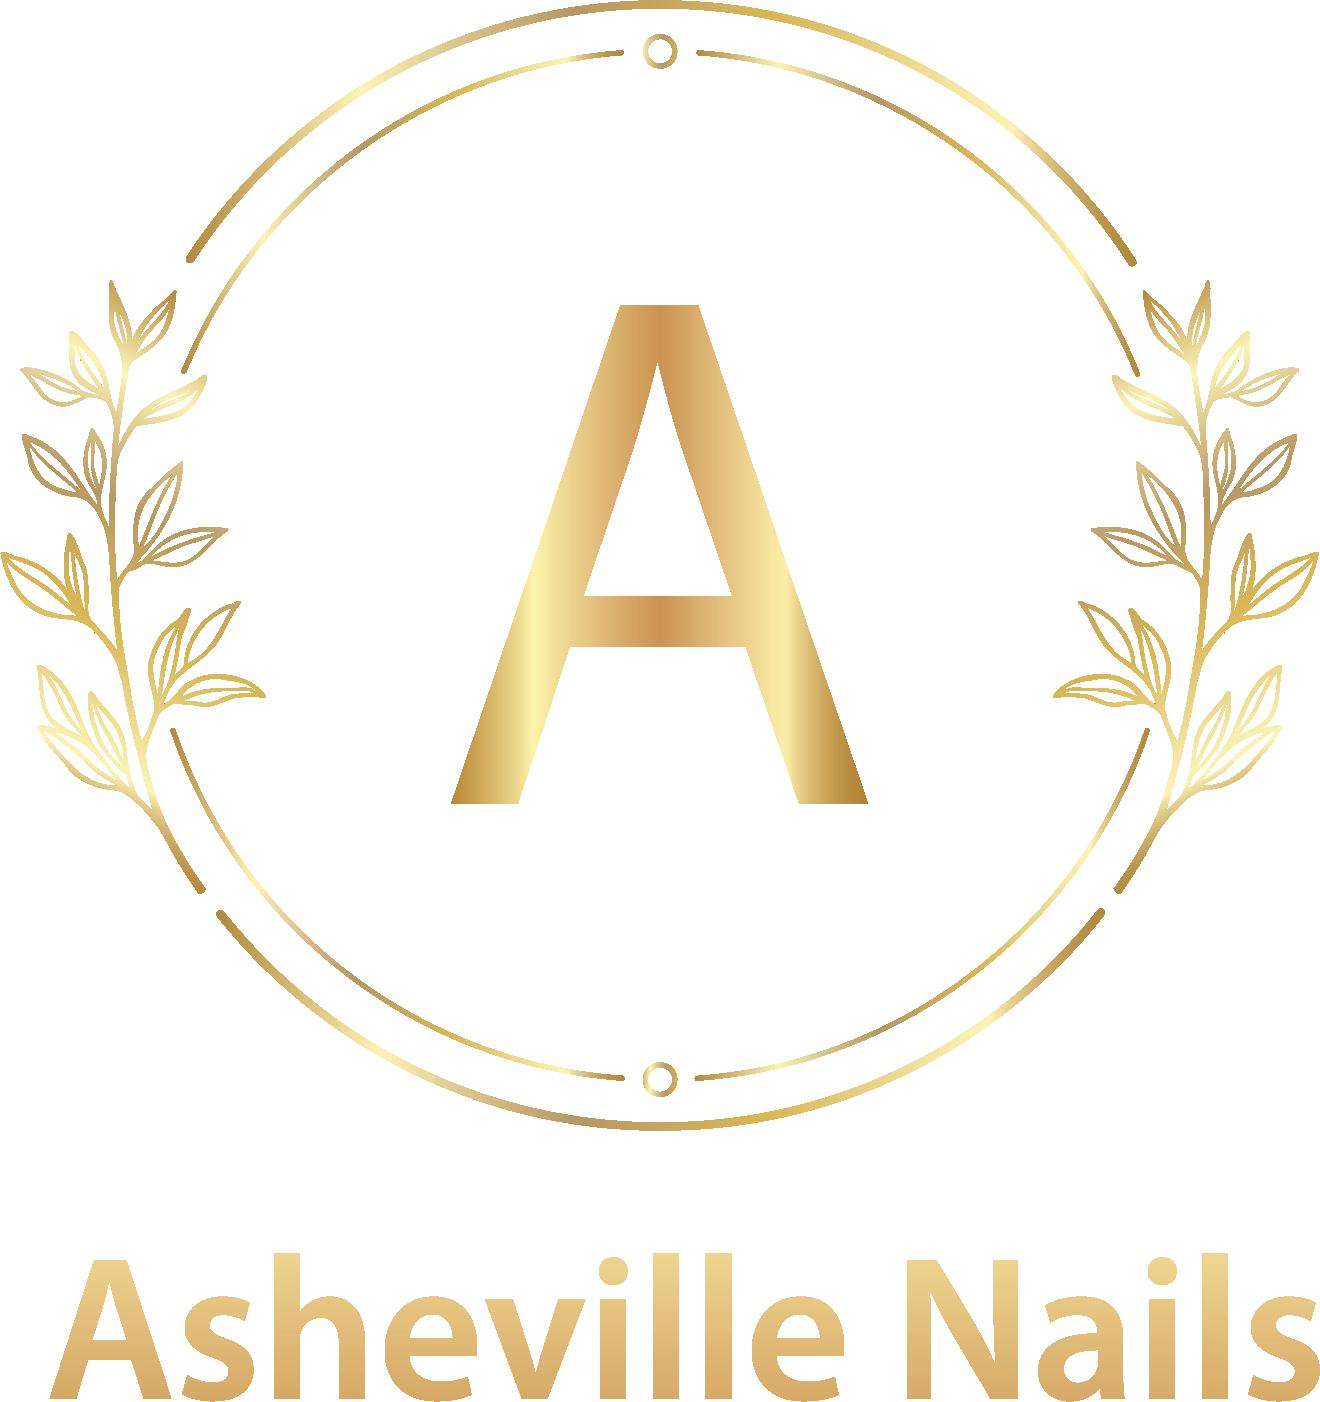 Asheville Nails